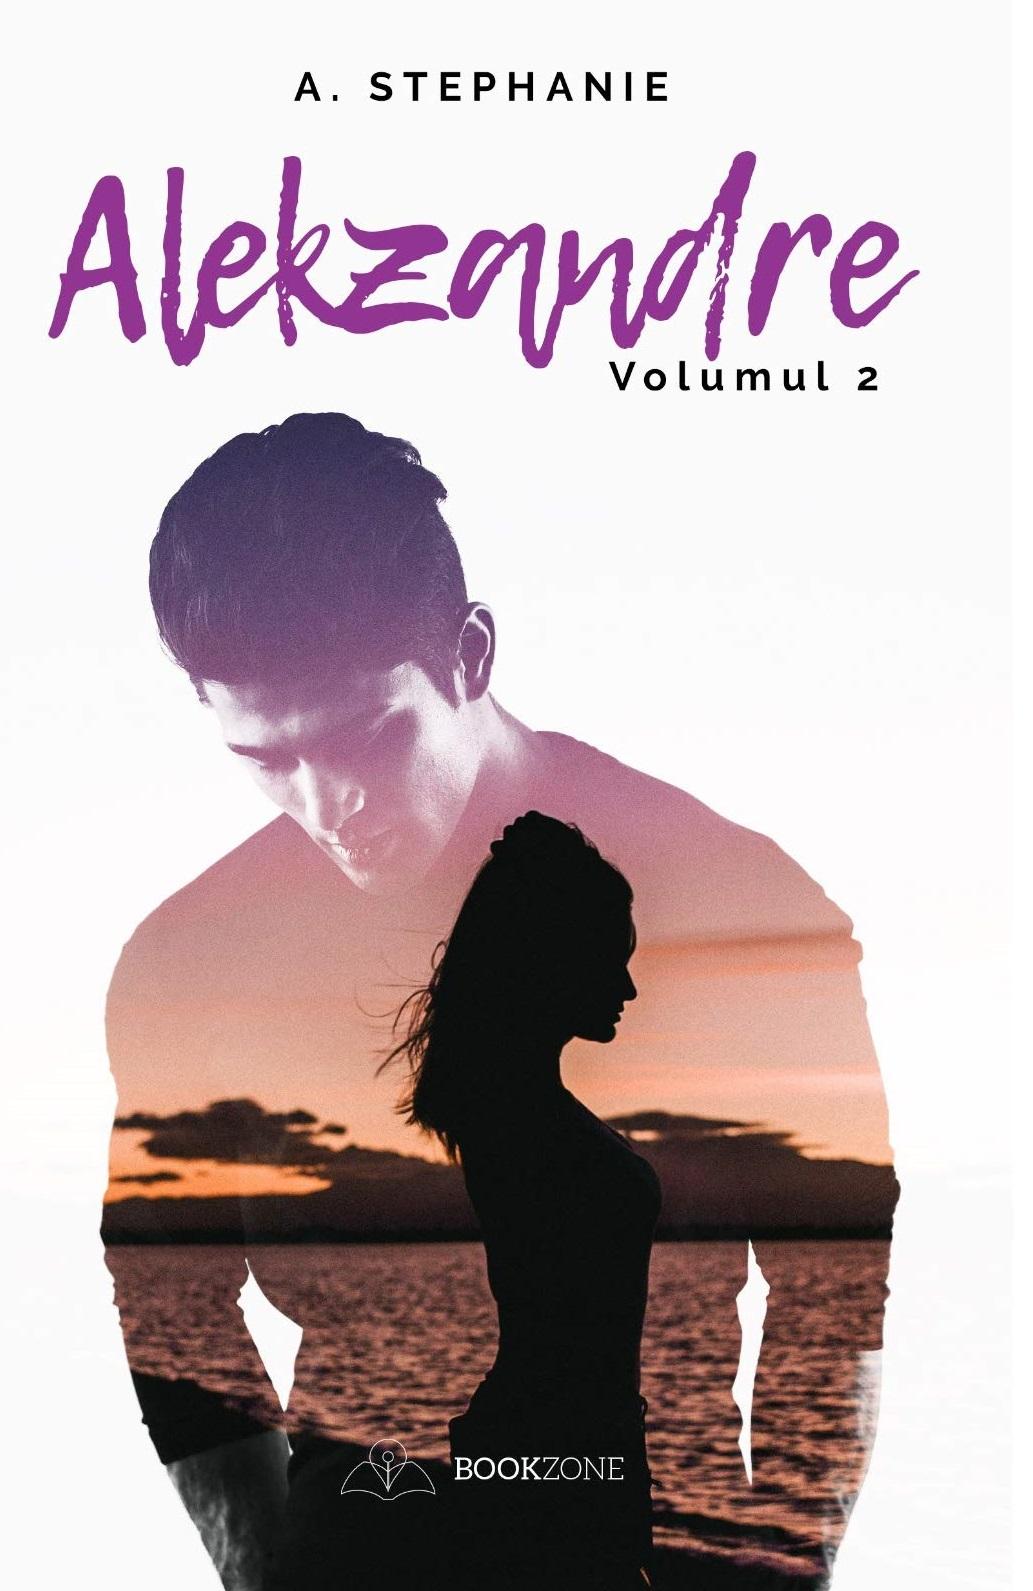 Alekzandre - Volumul 2 | A. Stephanie